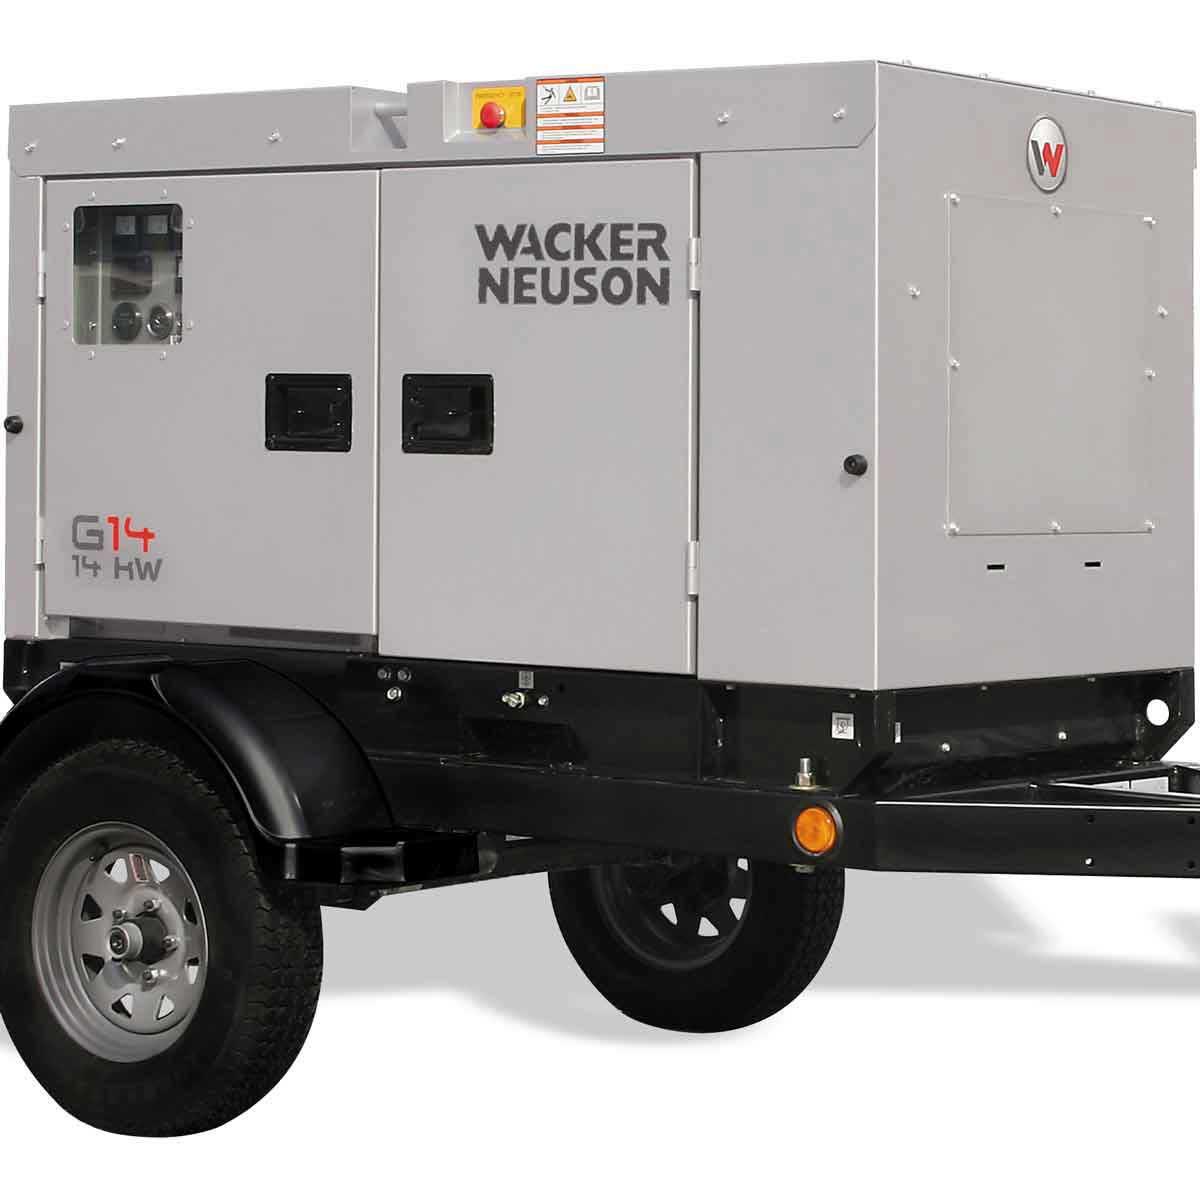 Wacker Neuson 14,000 watt mobile generator